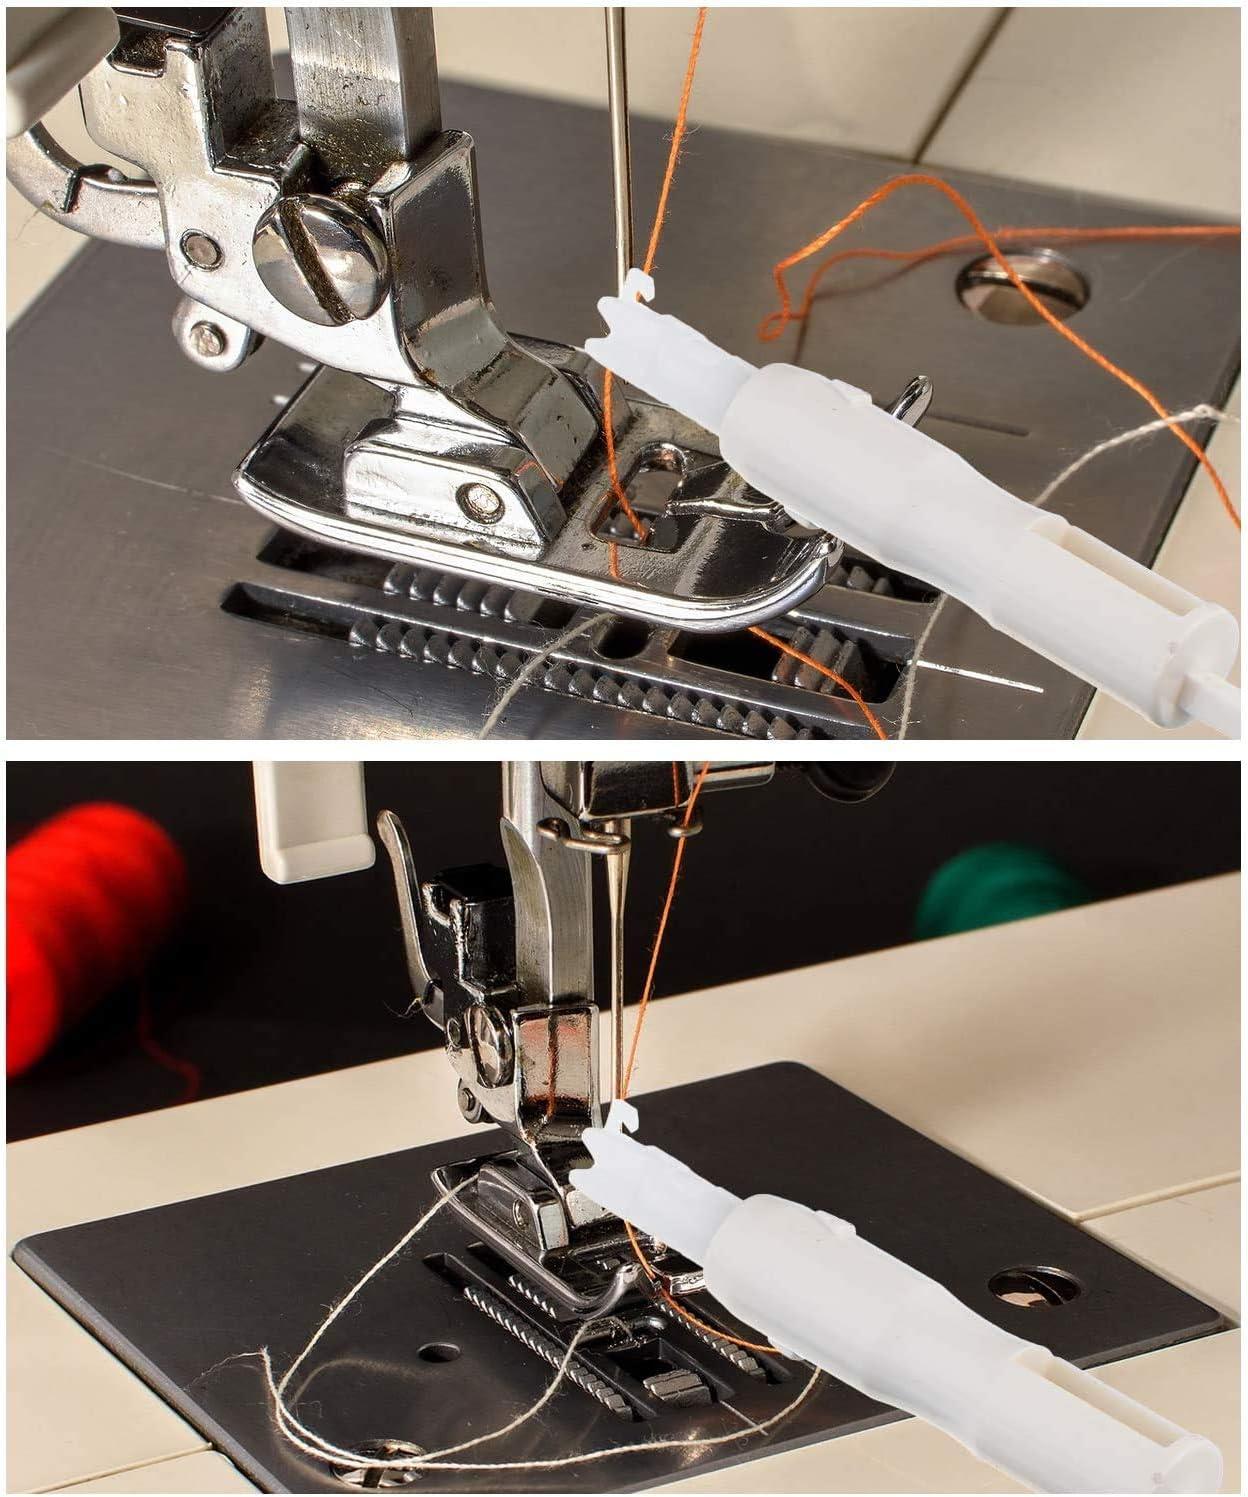 Blue and White 2 Pcs Sewing Machine Needle Threader Sewing Needle Inserter Automatic Needle Threader Needle Threading Tool Threading Device for Household DIY Sewing Machine